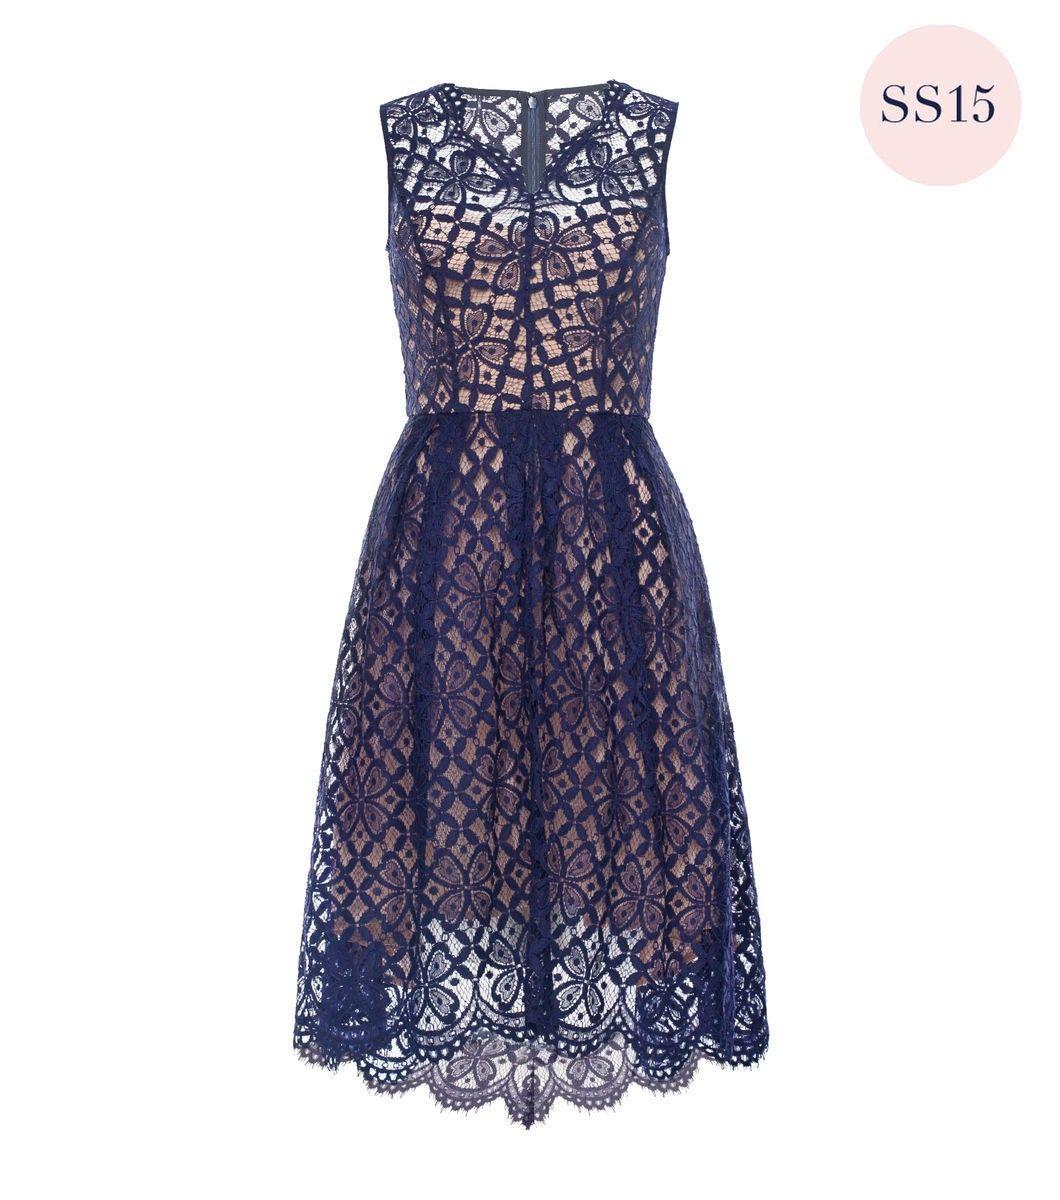 Alannah Hill Online Boutique - Women\'s Clothing - Last Goodbye Dress ...